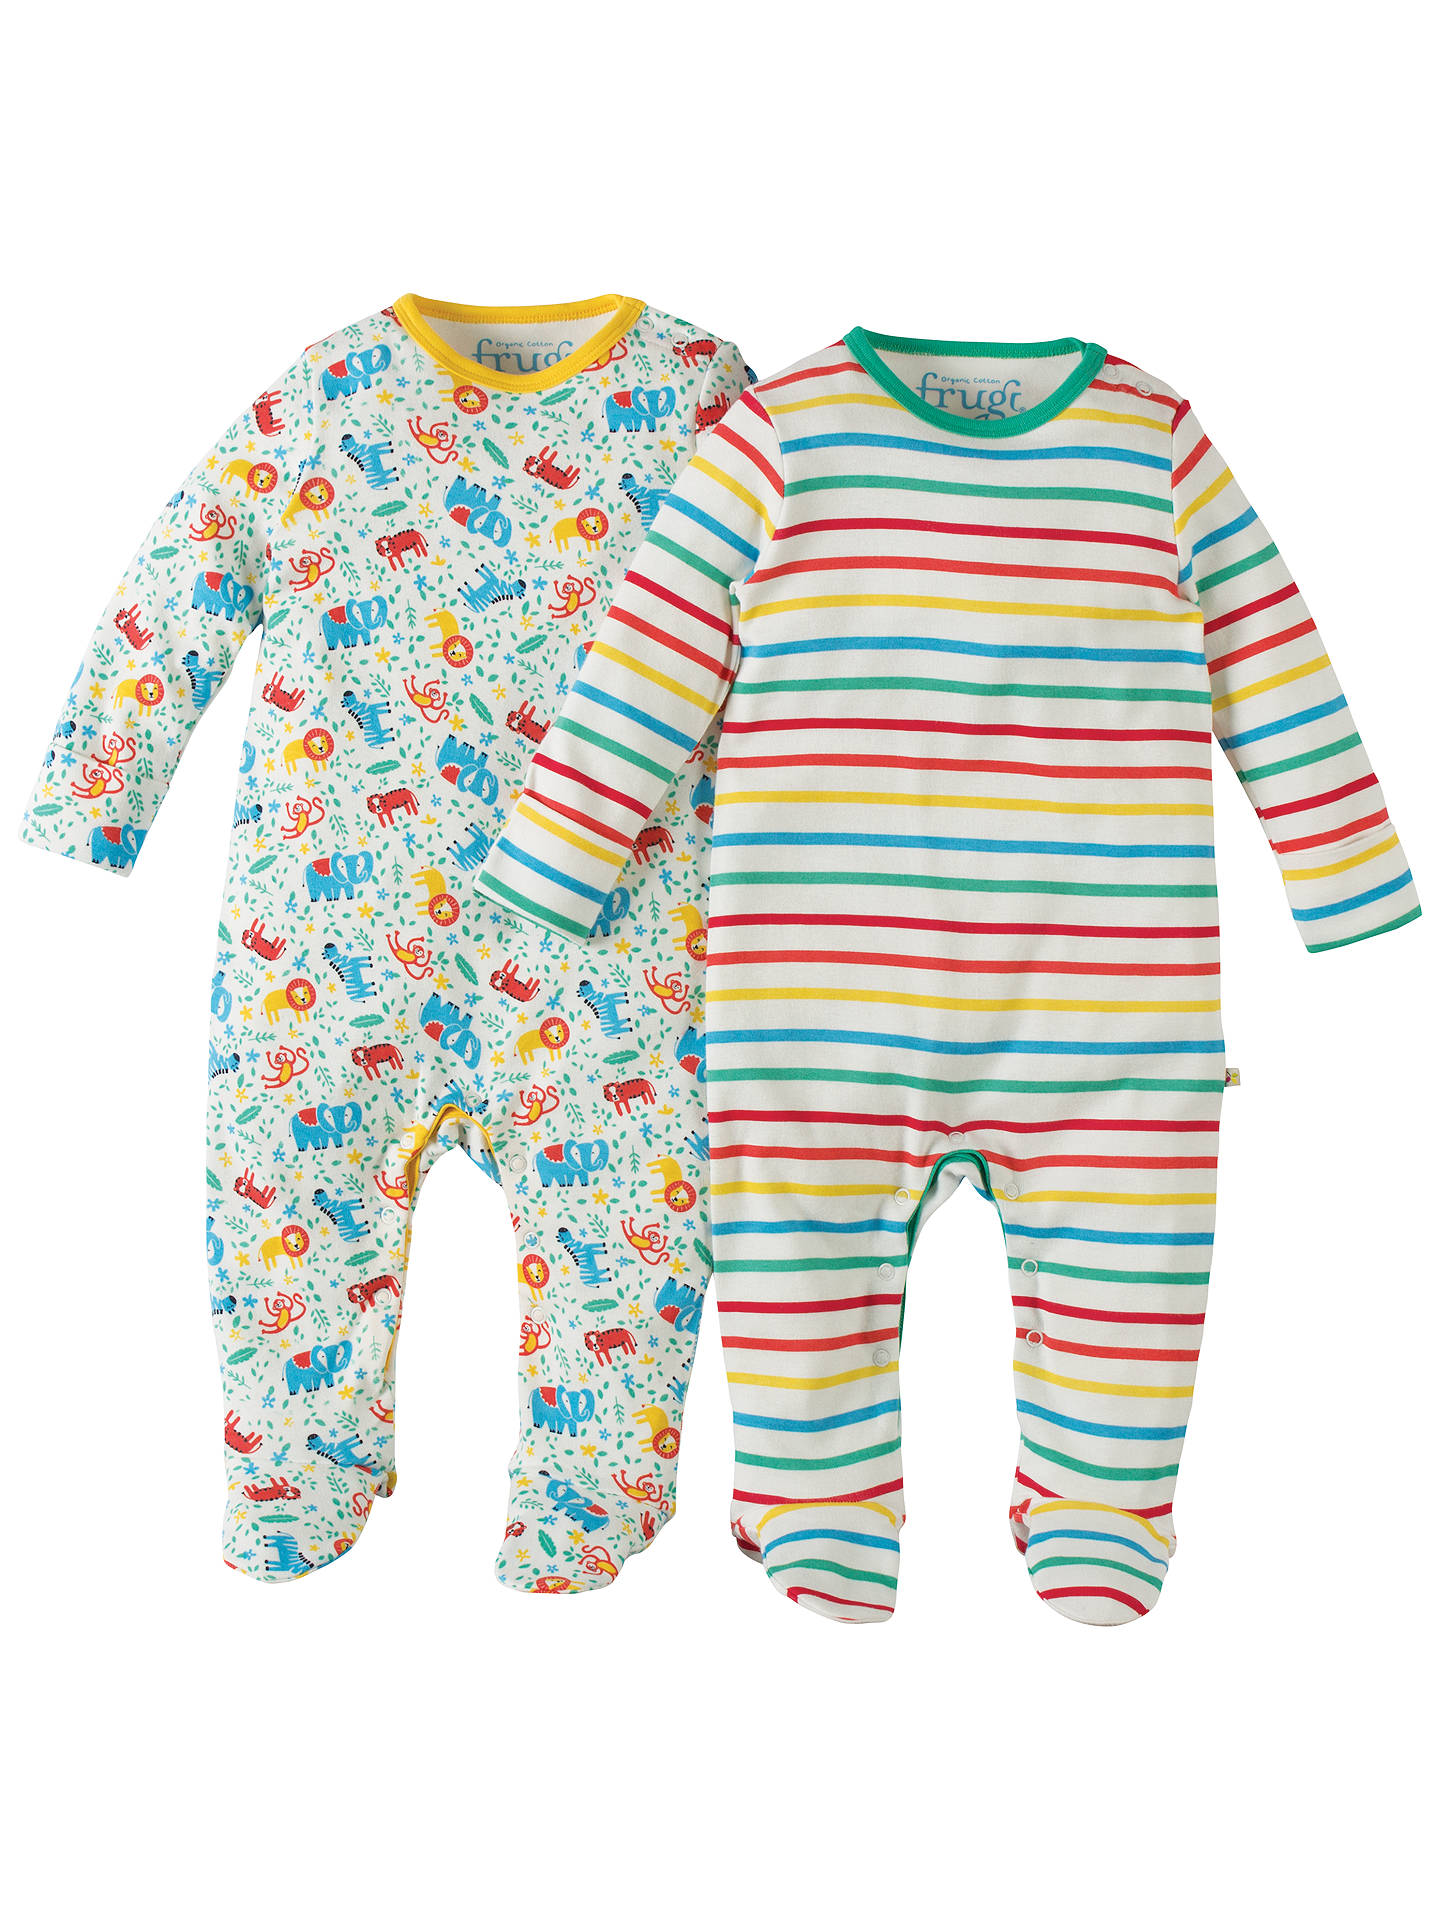 6aec53d8cc77 Frugi Organic Baby Striped Zoo Print Sleepsuit